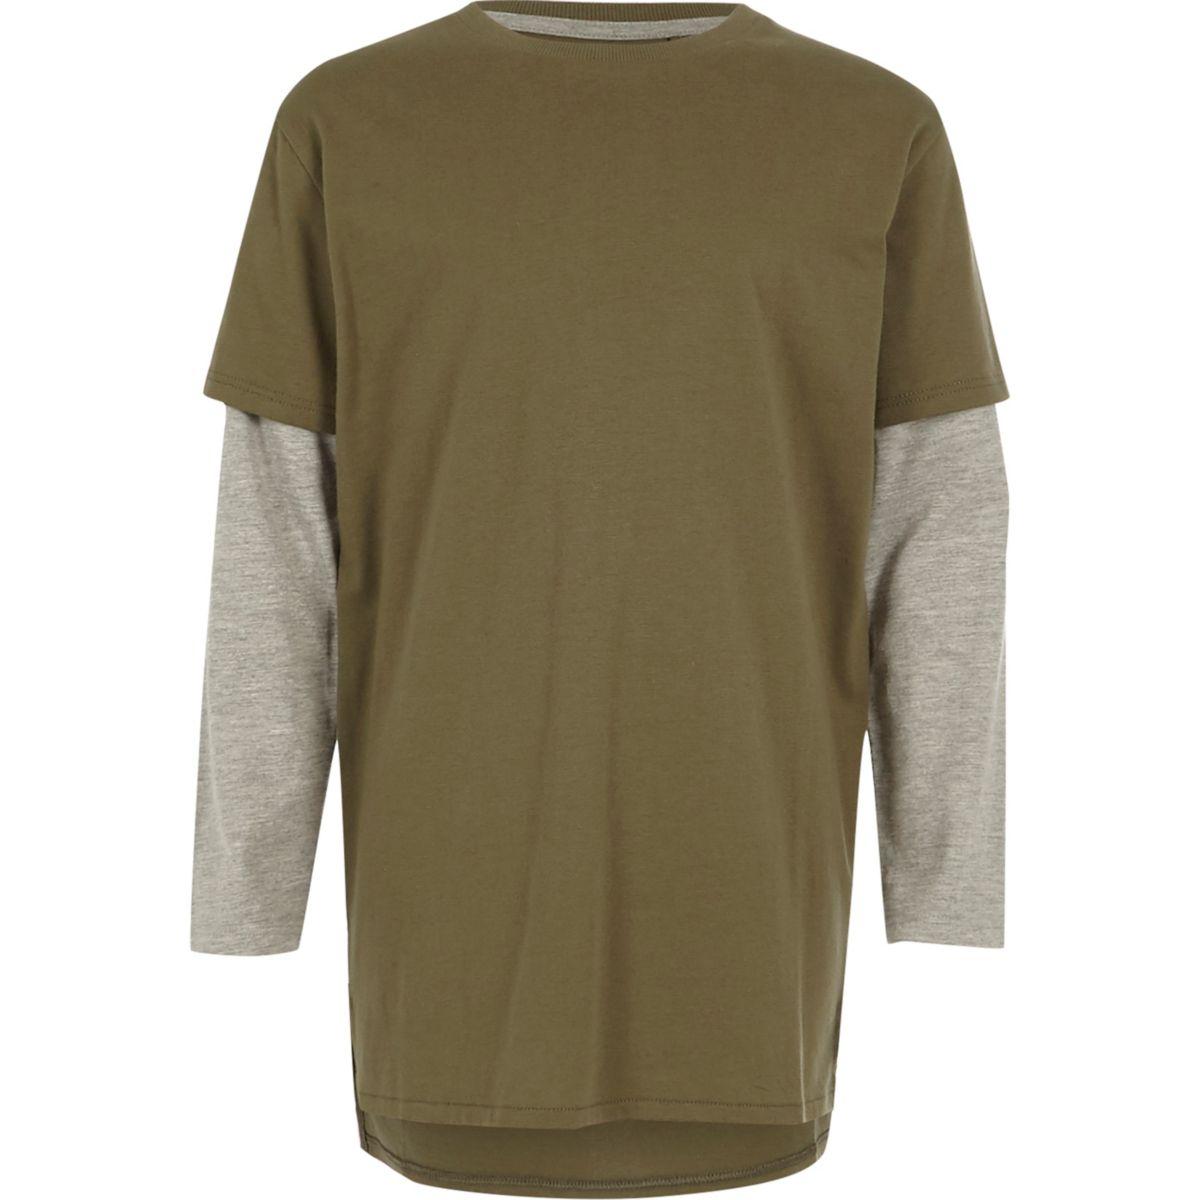 Boys khaki double layer T-shirt